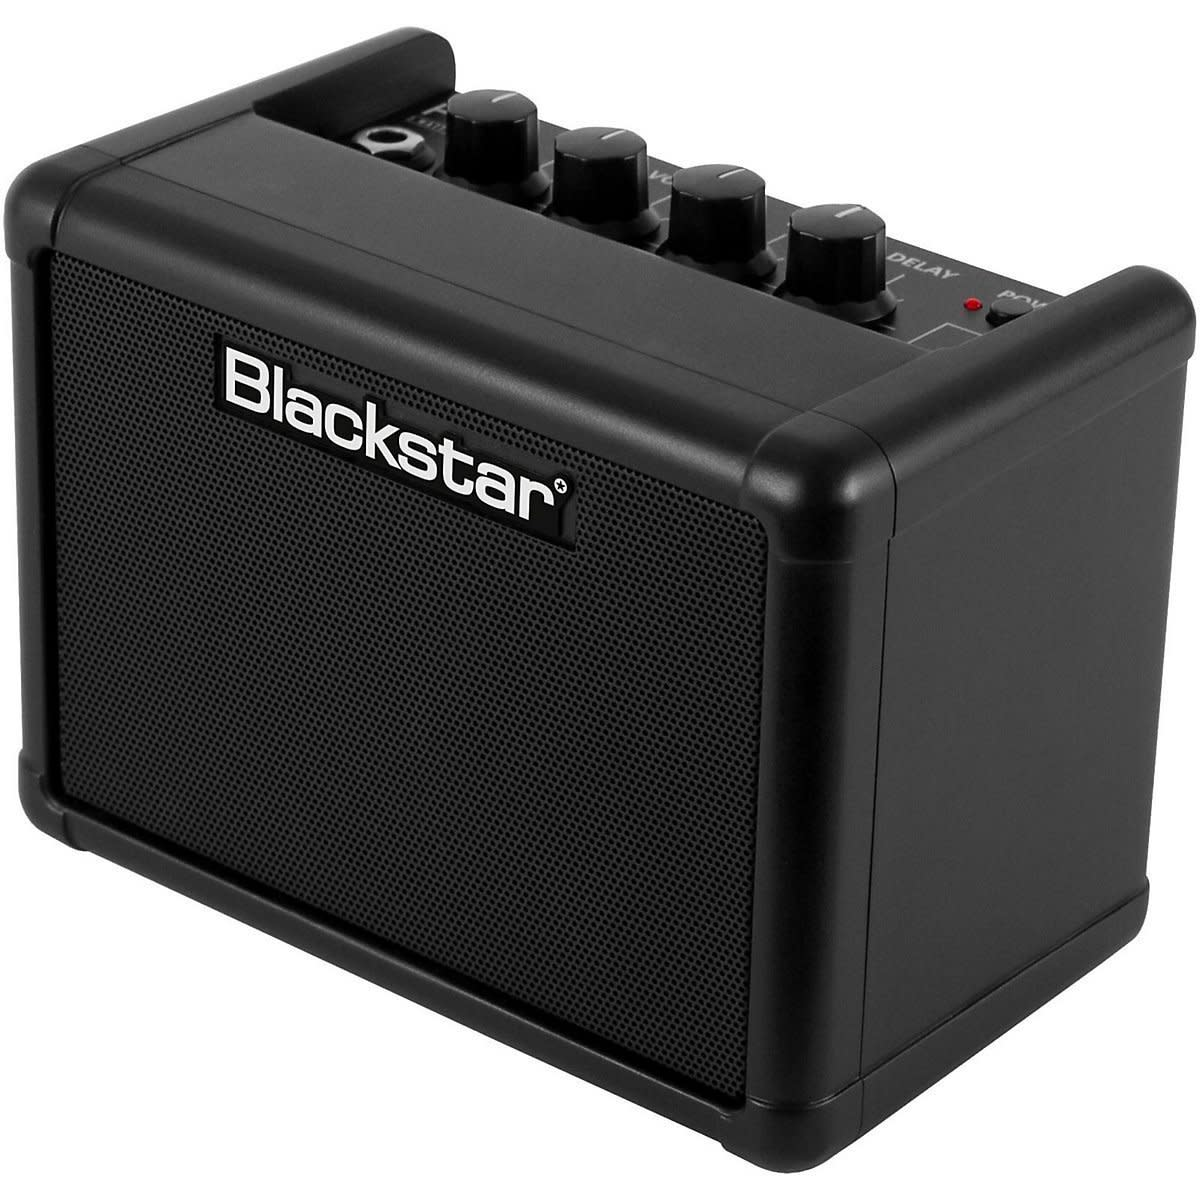 Blackstar Fly 3 Guitar Amp